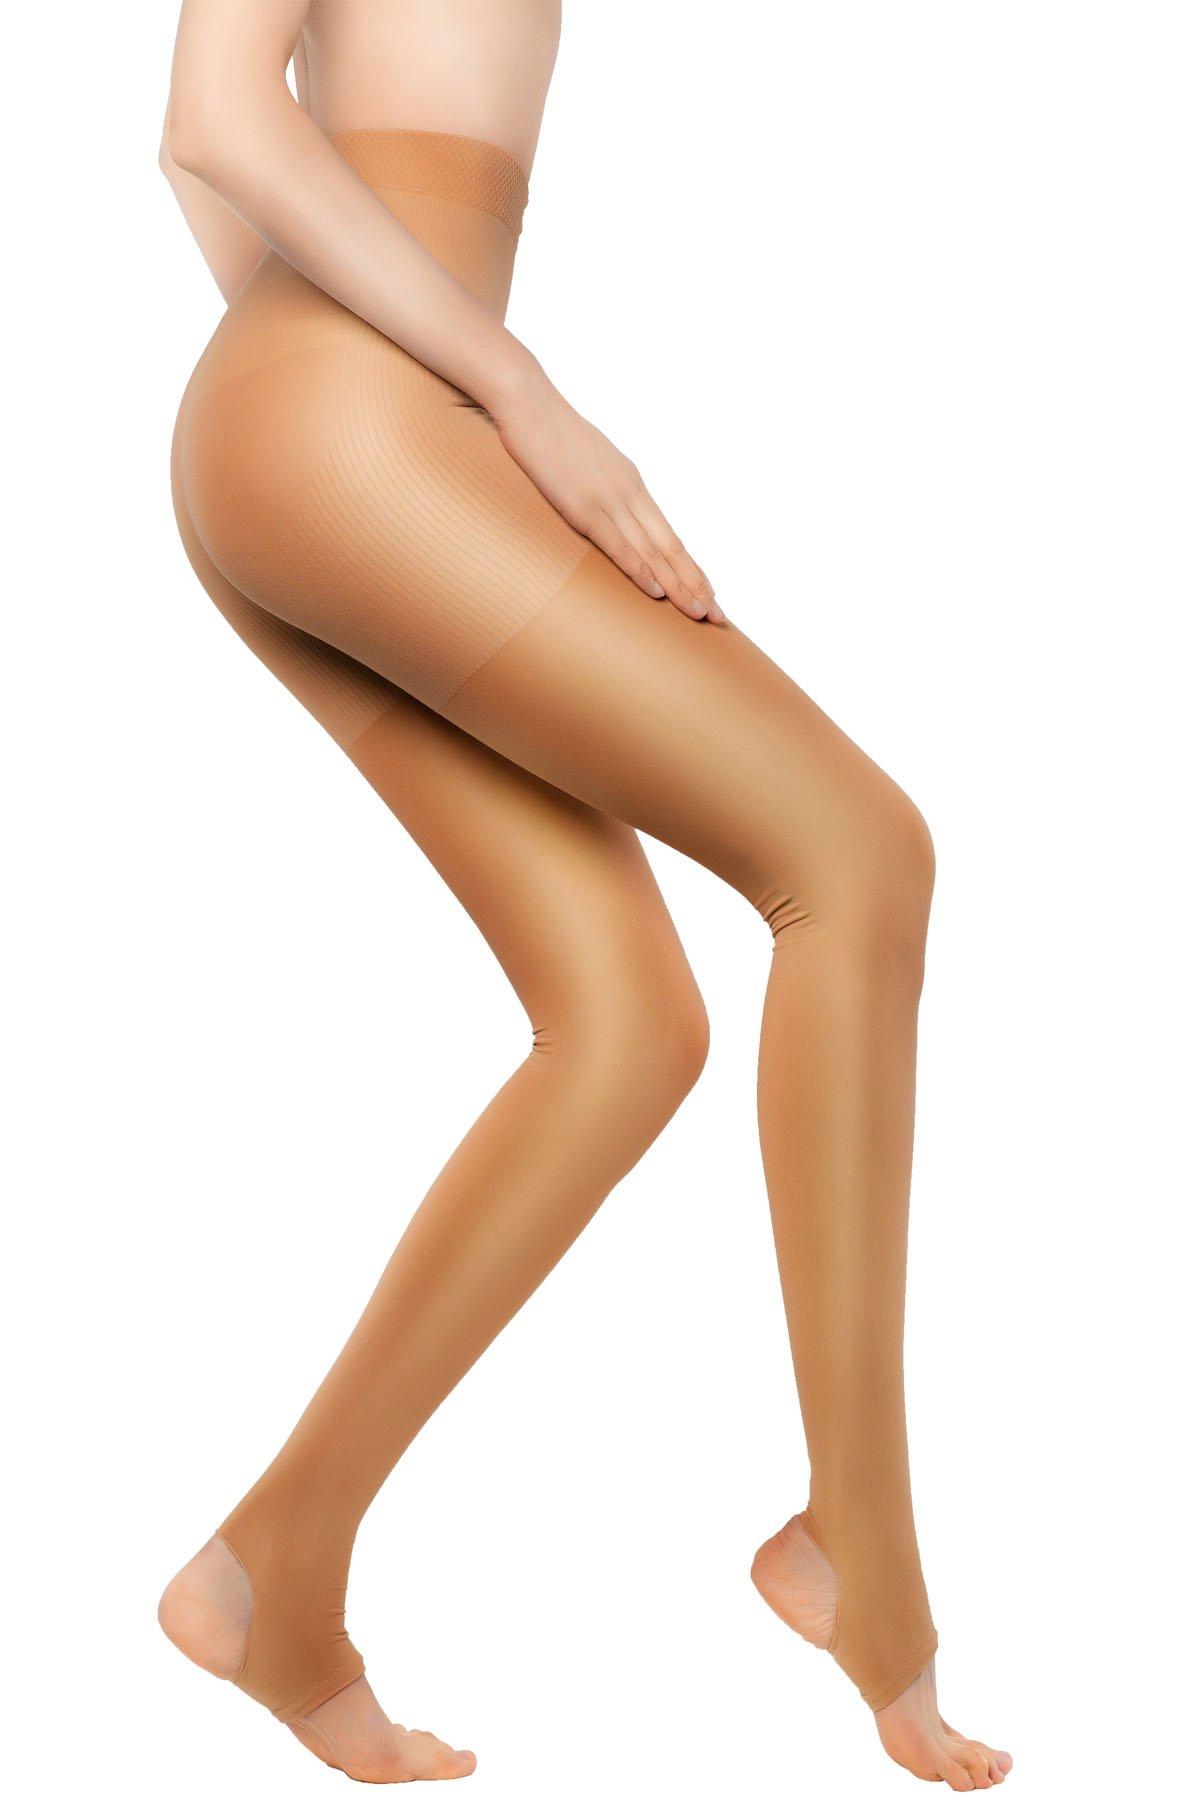 e8e6cb1c1c +MD 15-20mmHg Women's Open Toe Compression Pantyhose Stirrup Medical  Quality Compressive Stocking NudeM